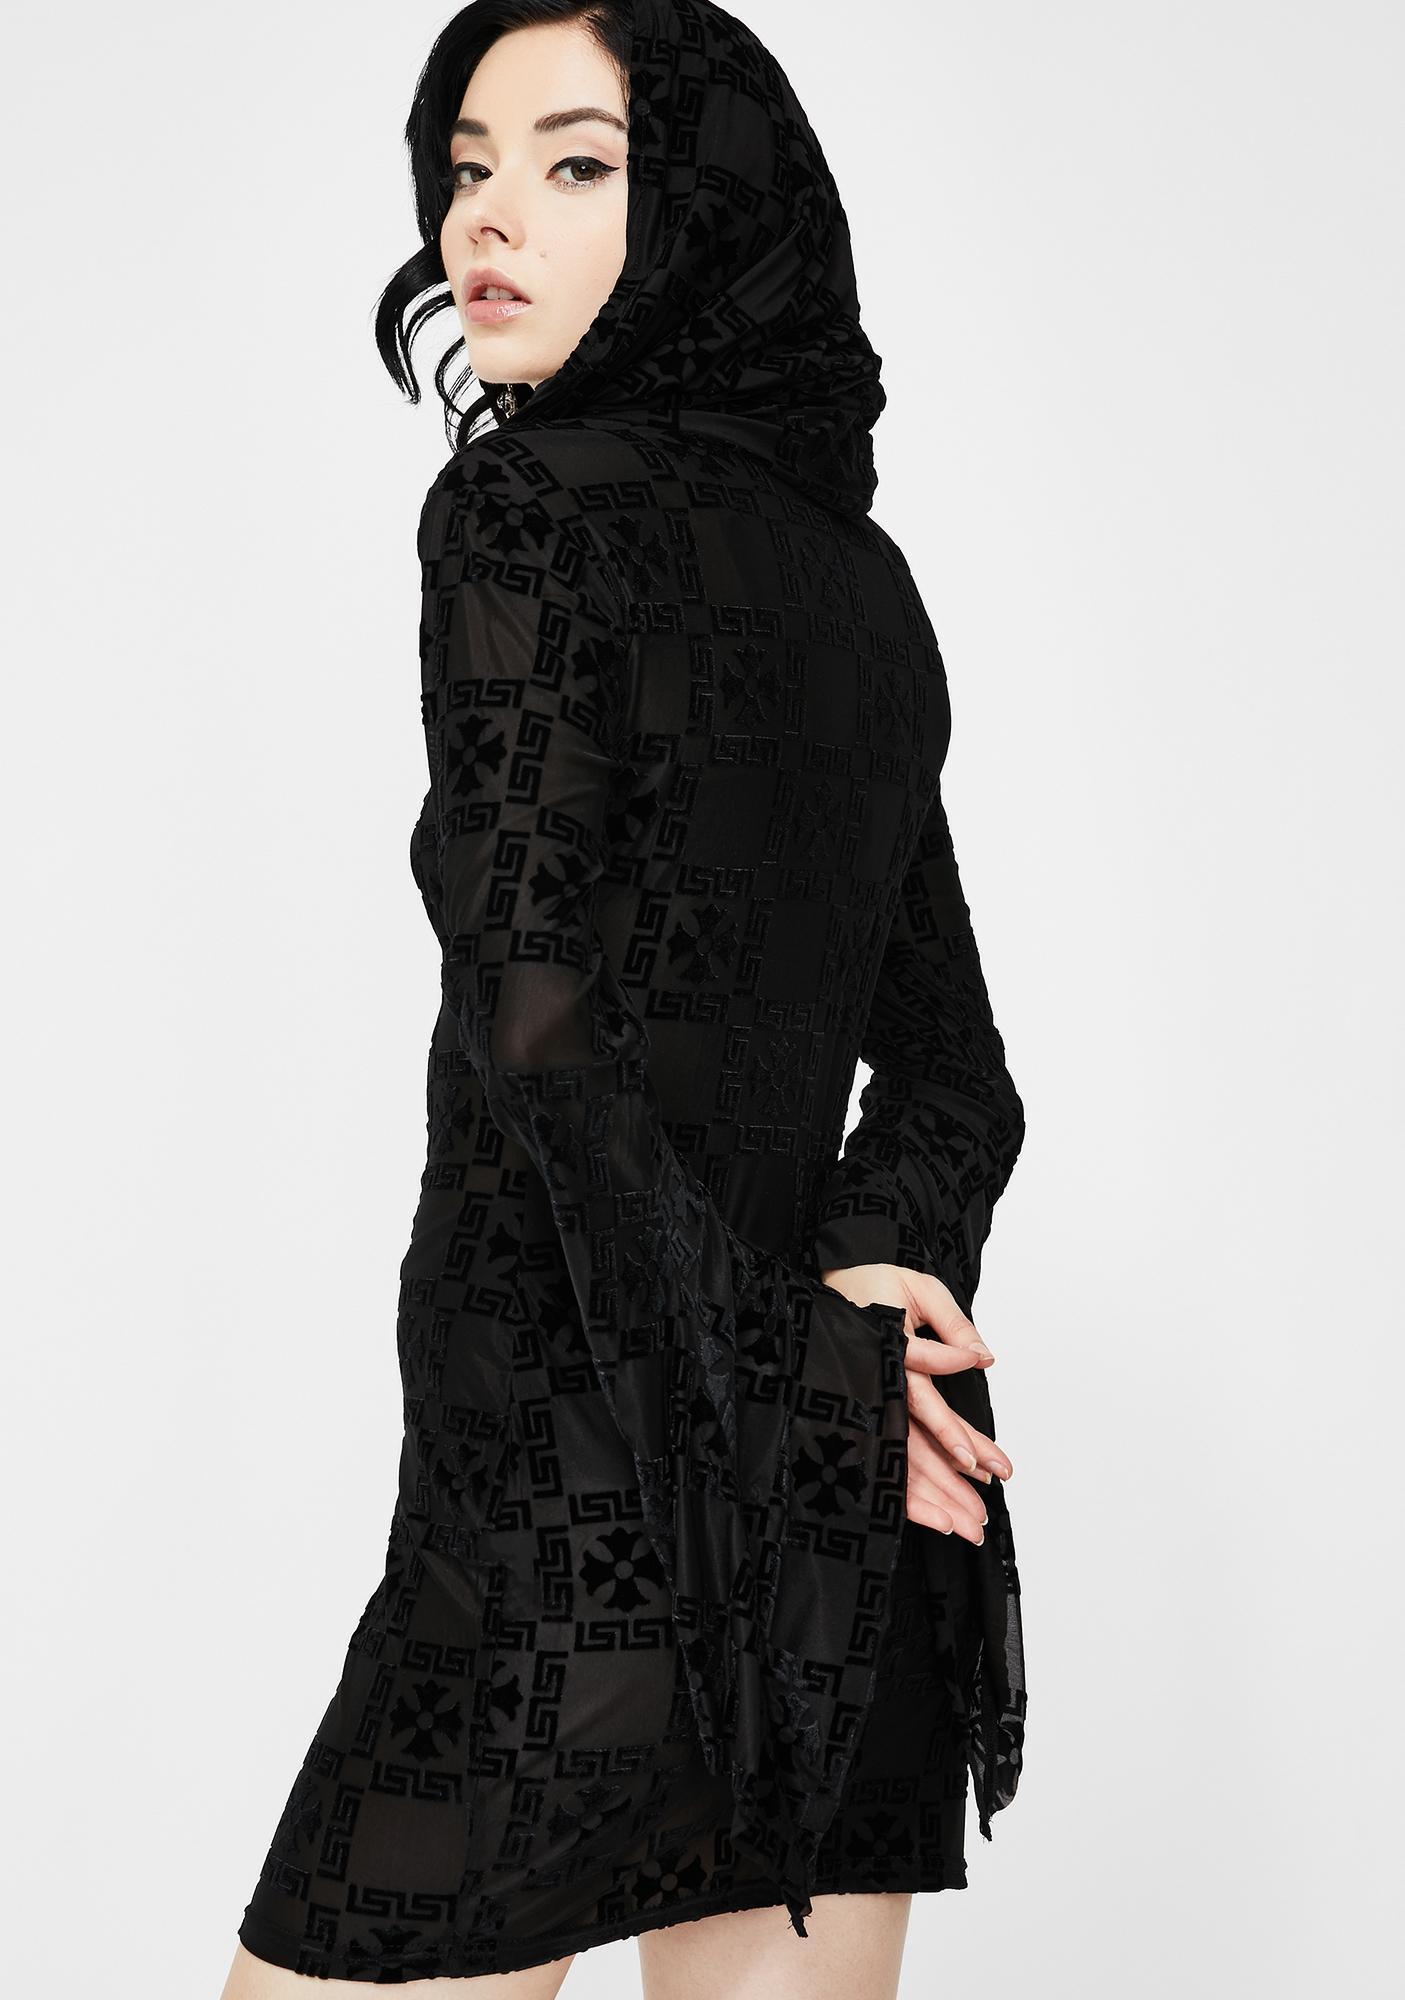 Devil Fashion Hooded Bell Sleeve Mini Dress